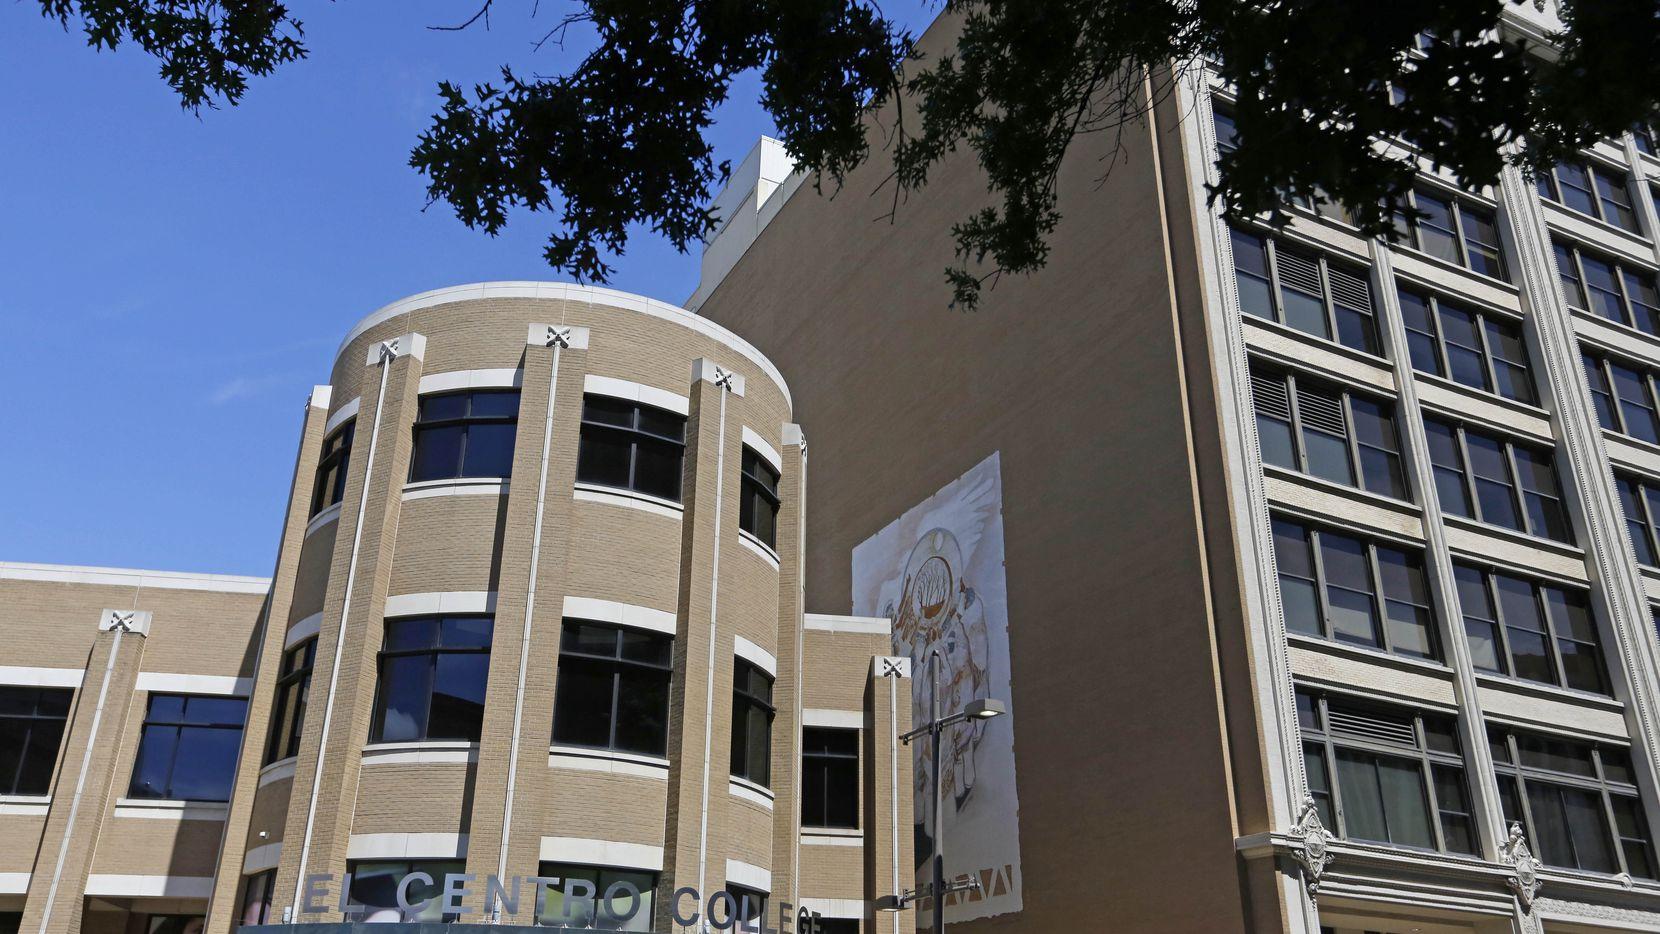 Dallas College's El Centro campus in downtown Dallas. (Louis DeLuca/The Dallas Morning News)